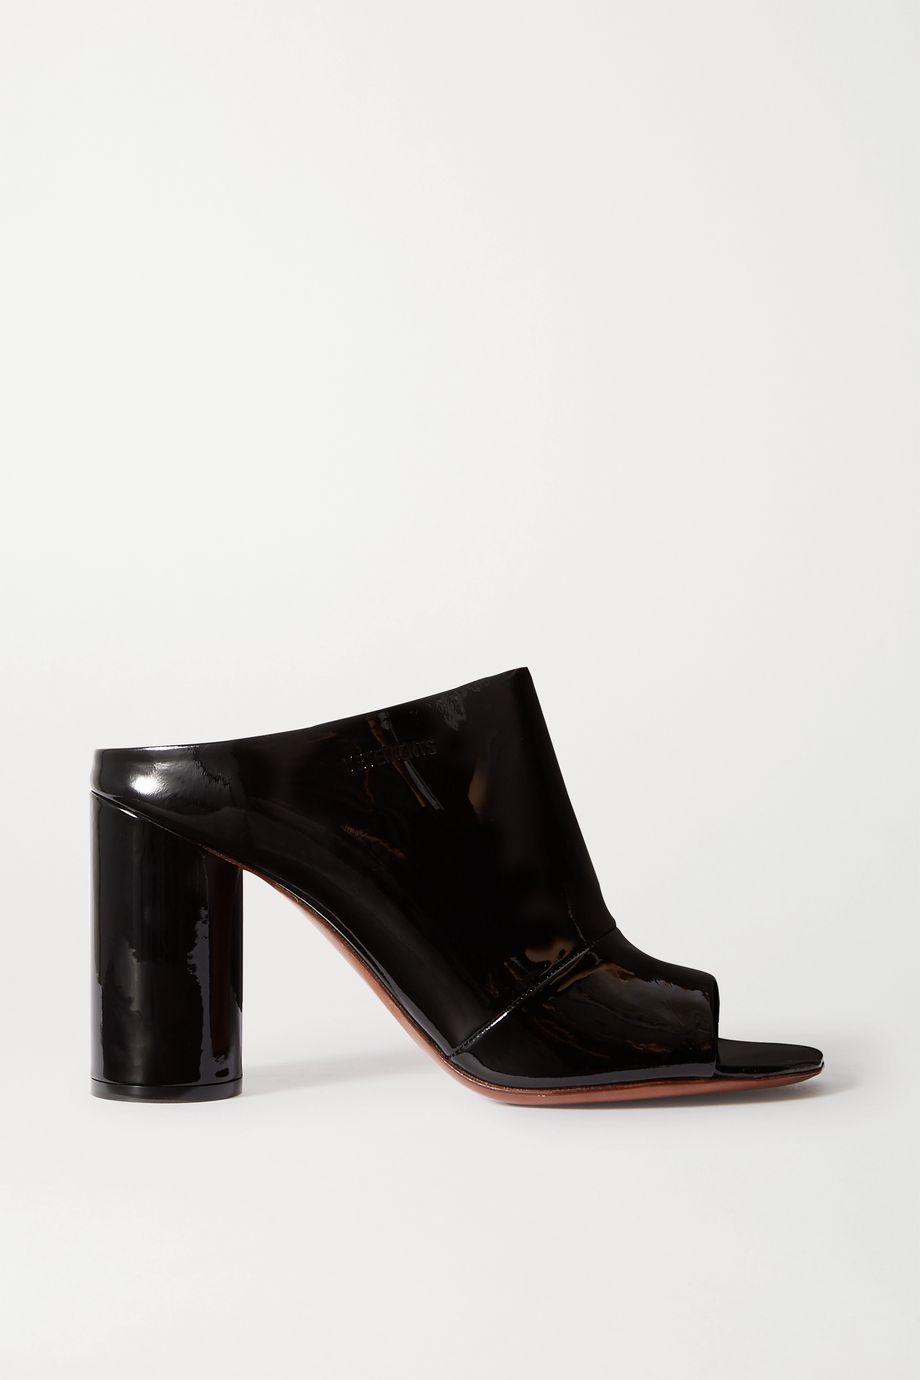 Vetements Patent-leather mules